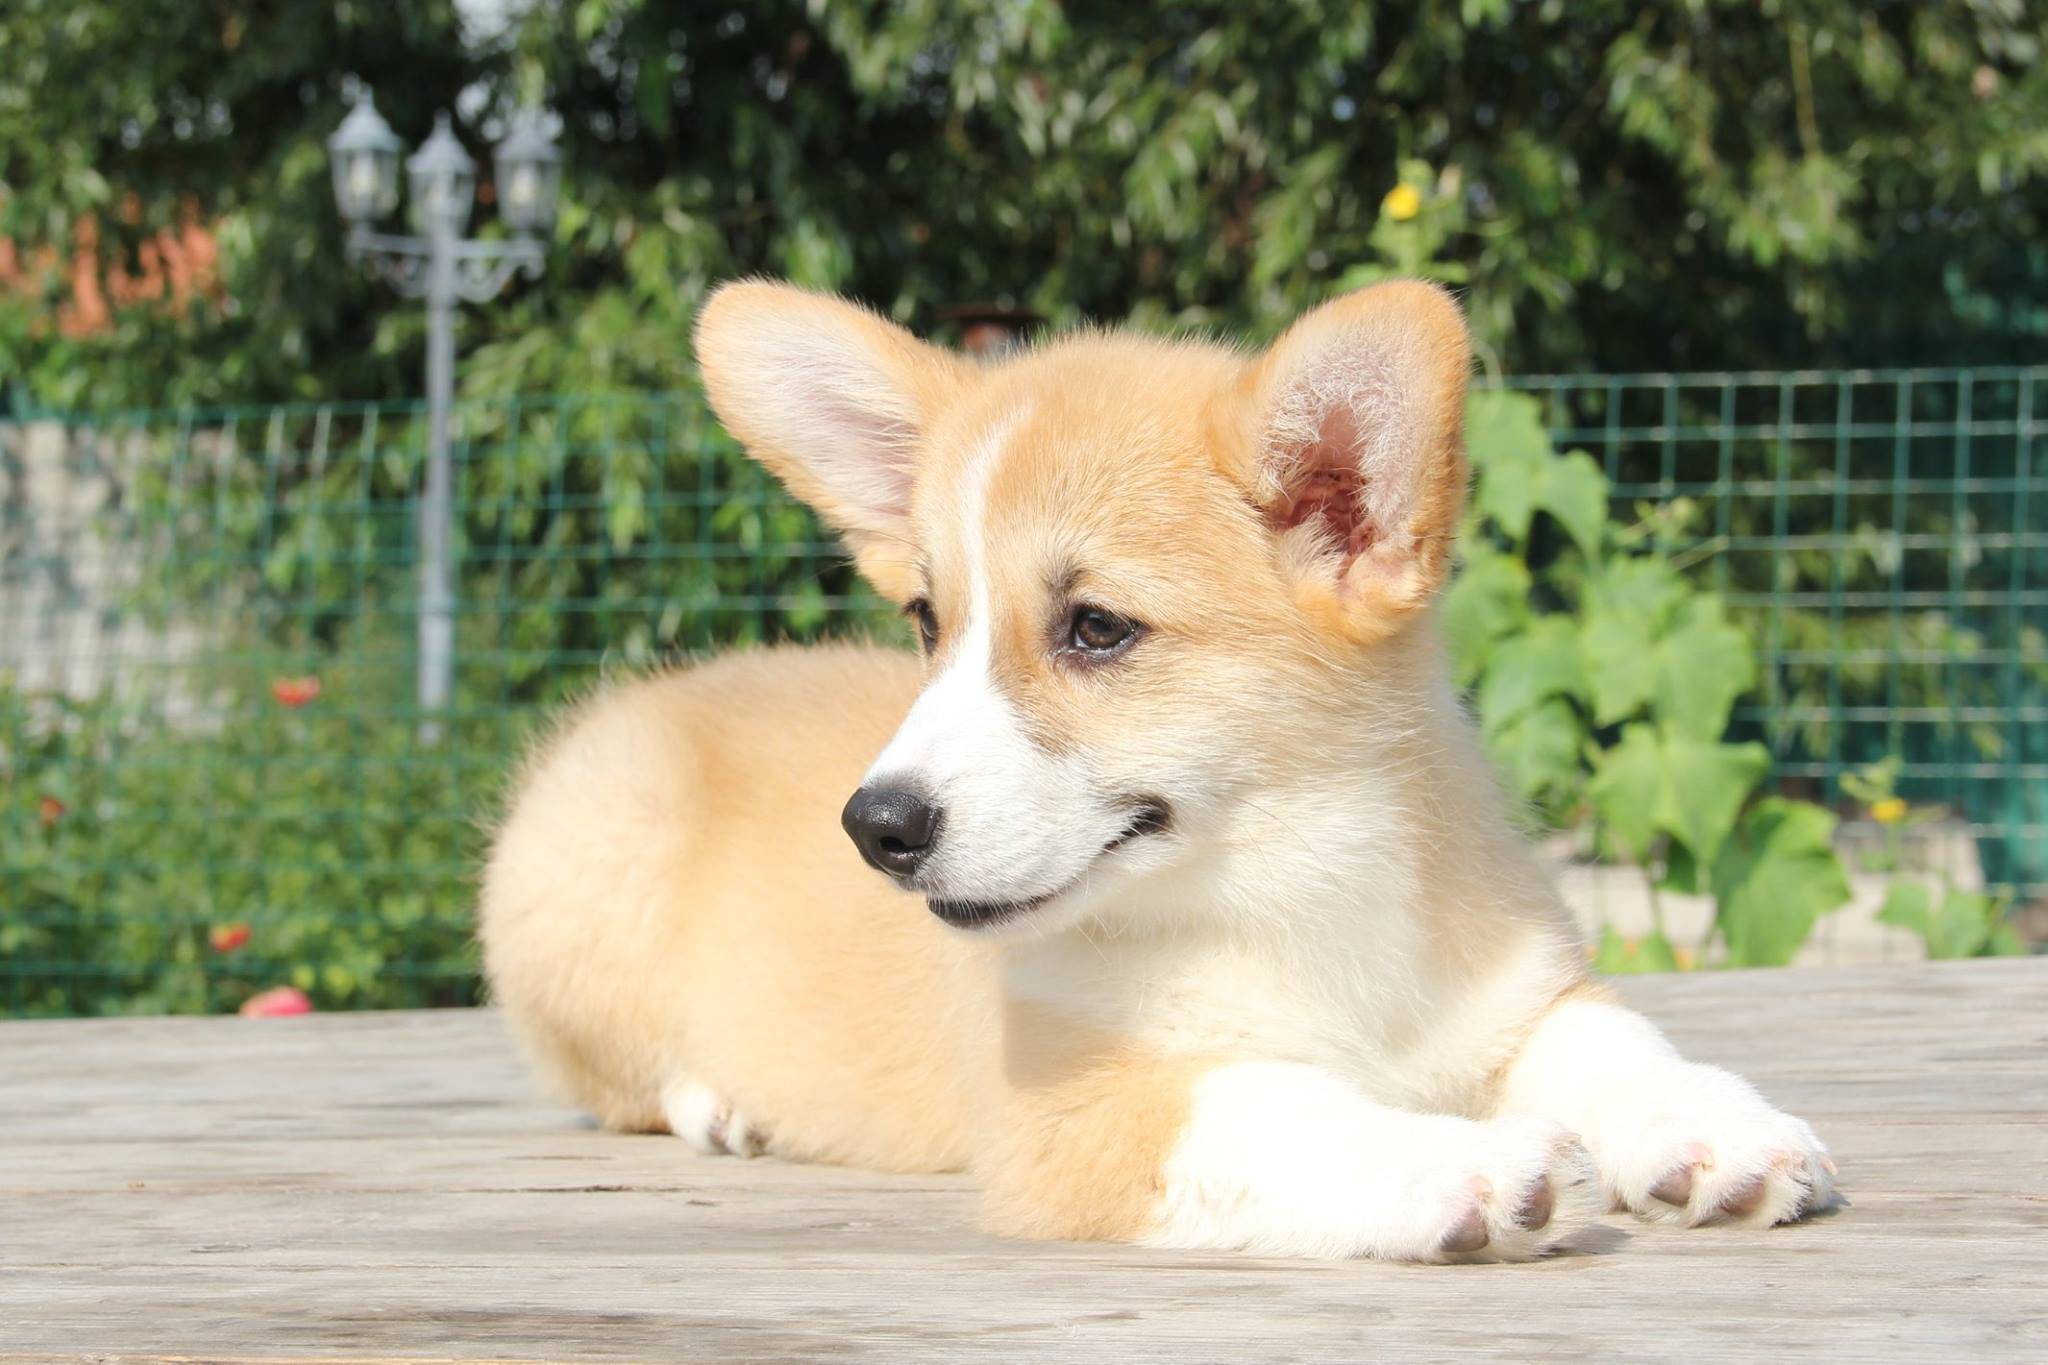 Лиса или собака: особенности ухода за породой вельш-корги